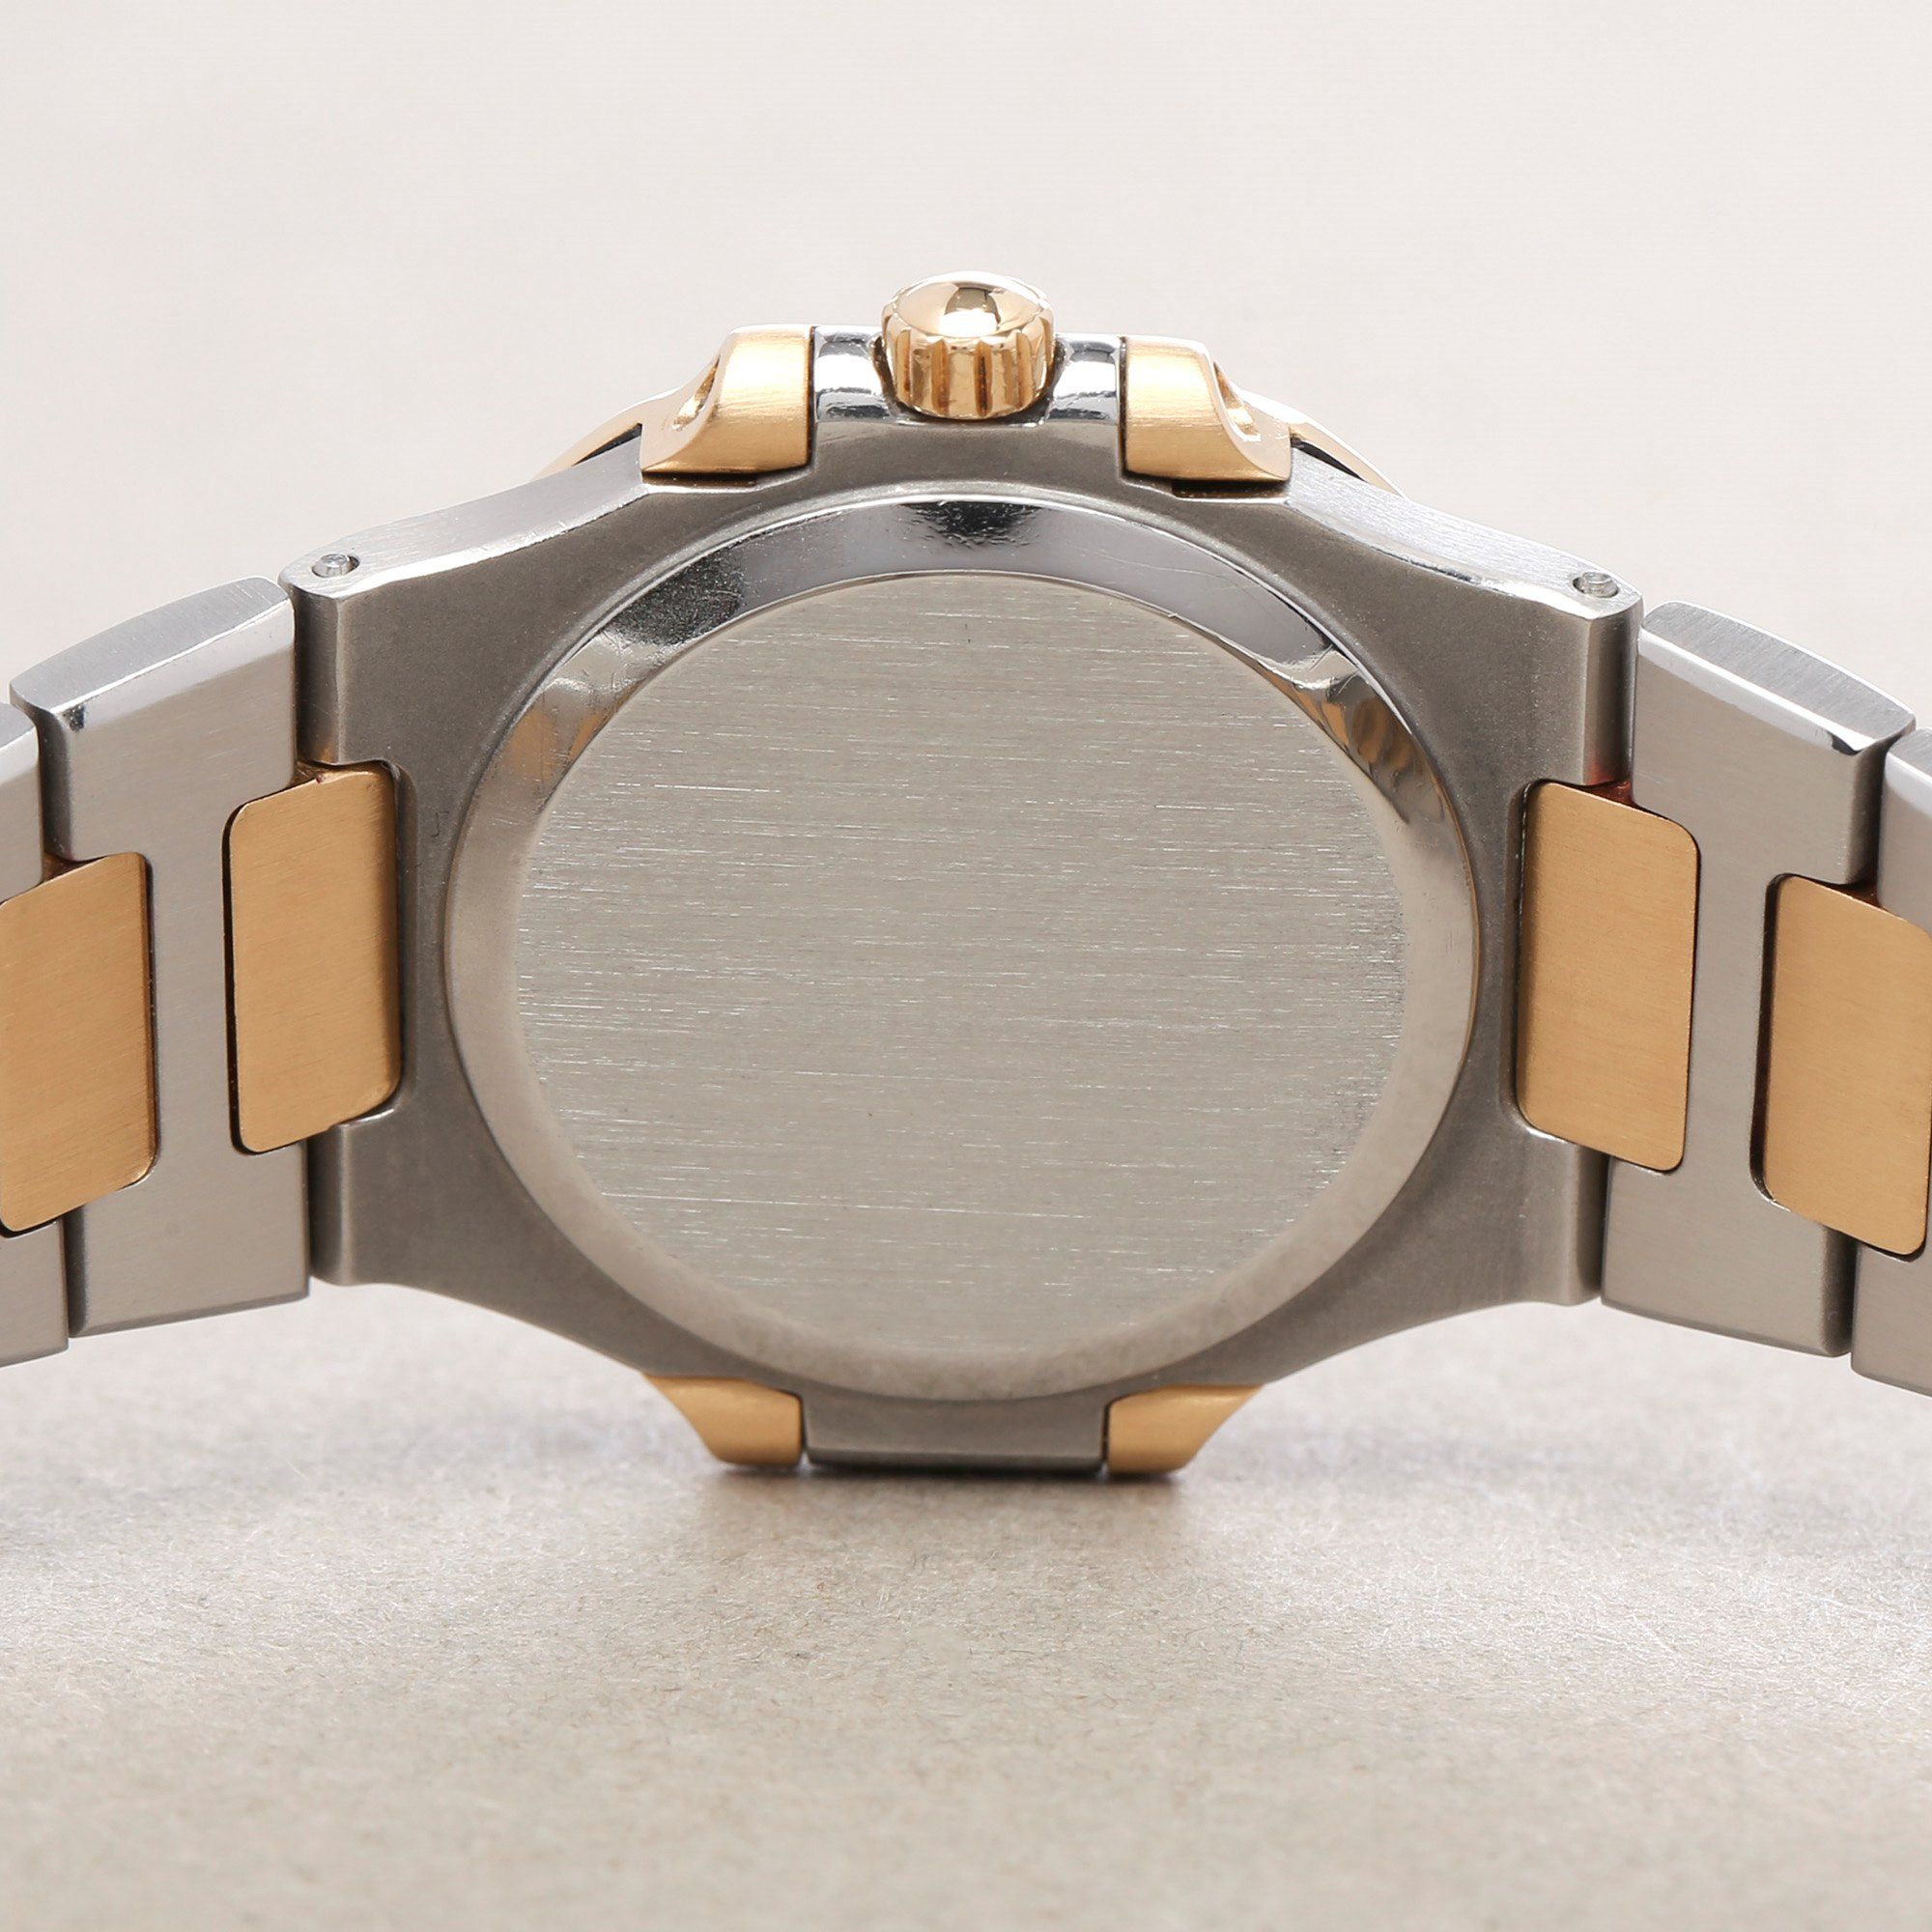 Patek Philippe Nautilus 18K Yellow Gold 4700/2